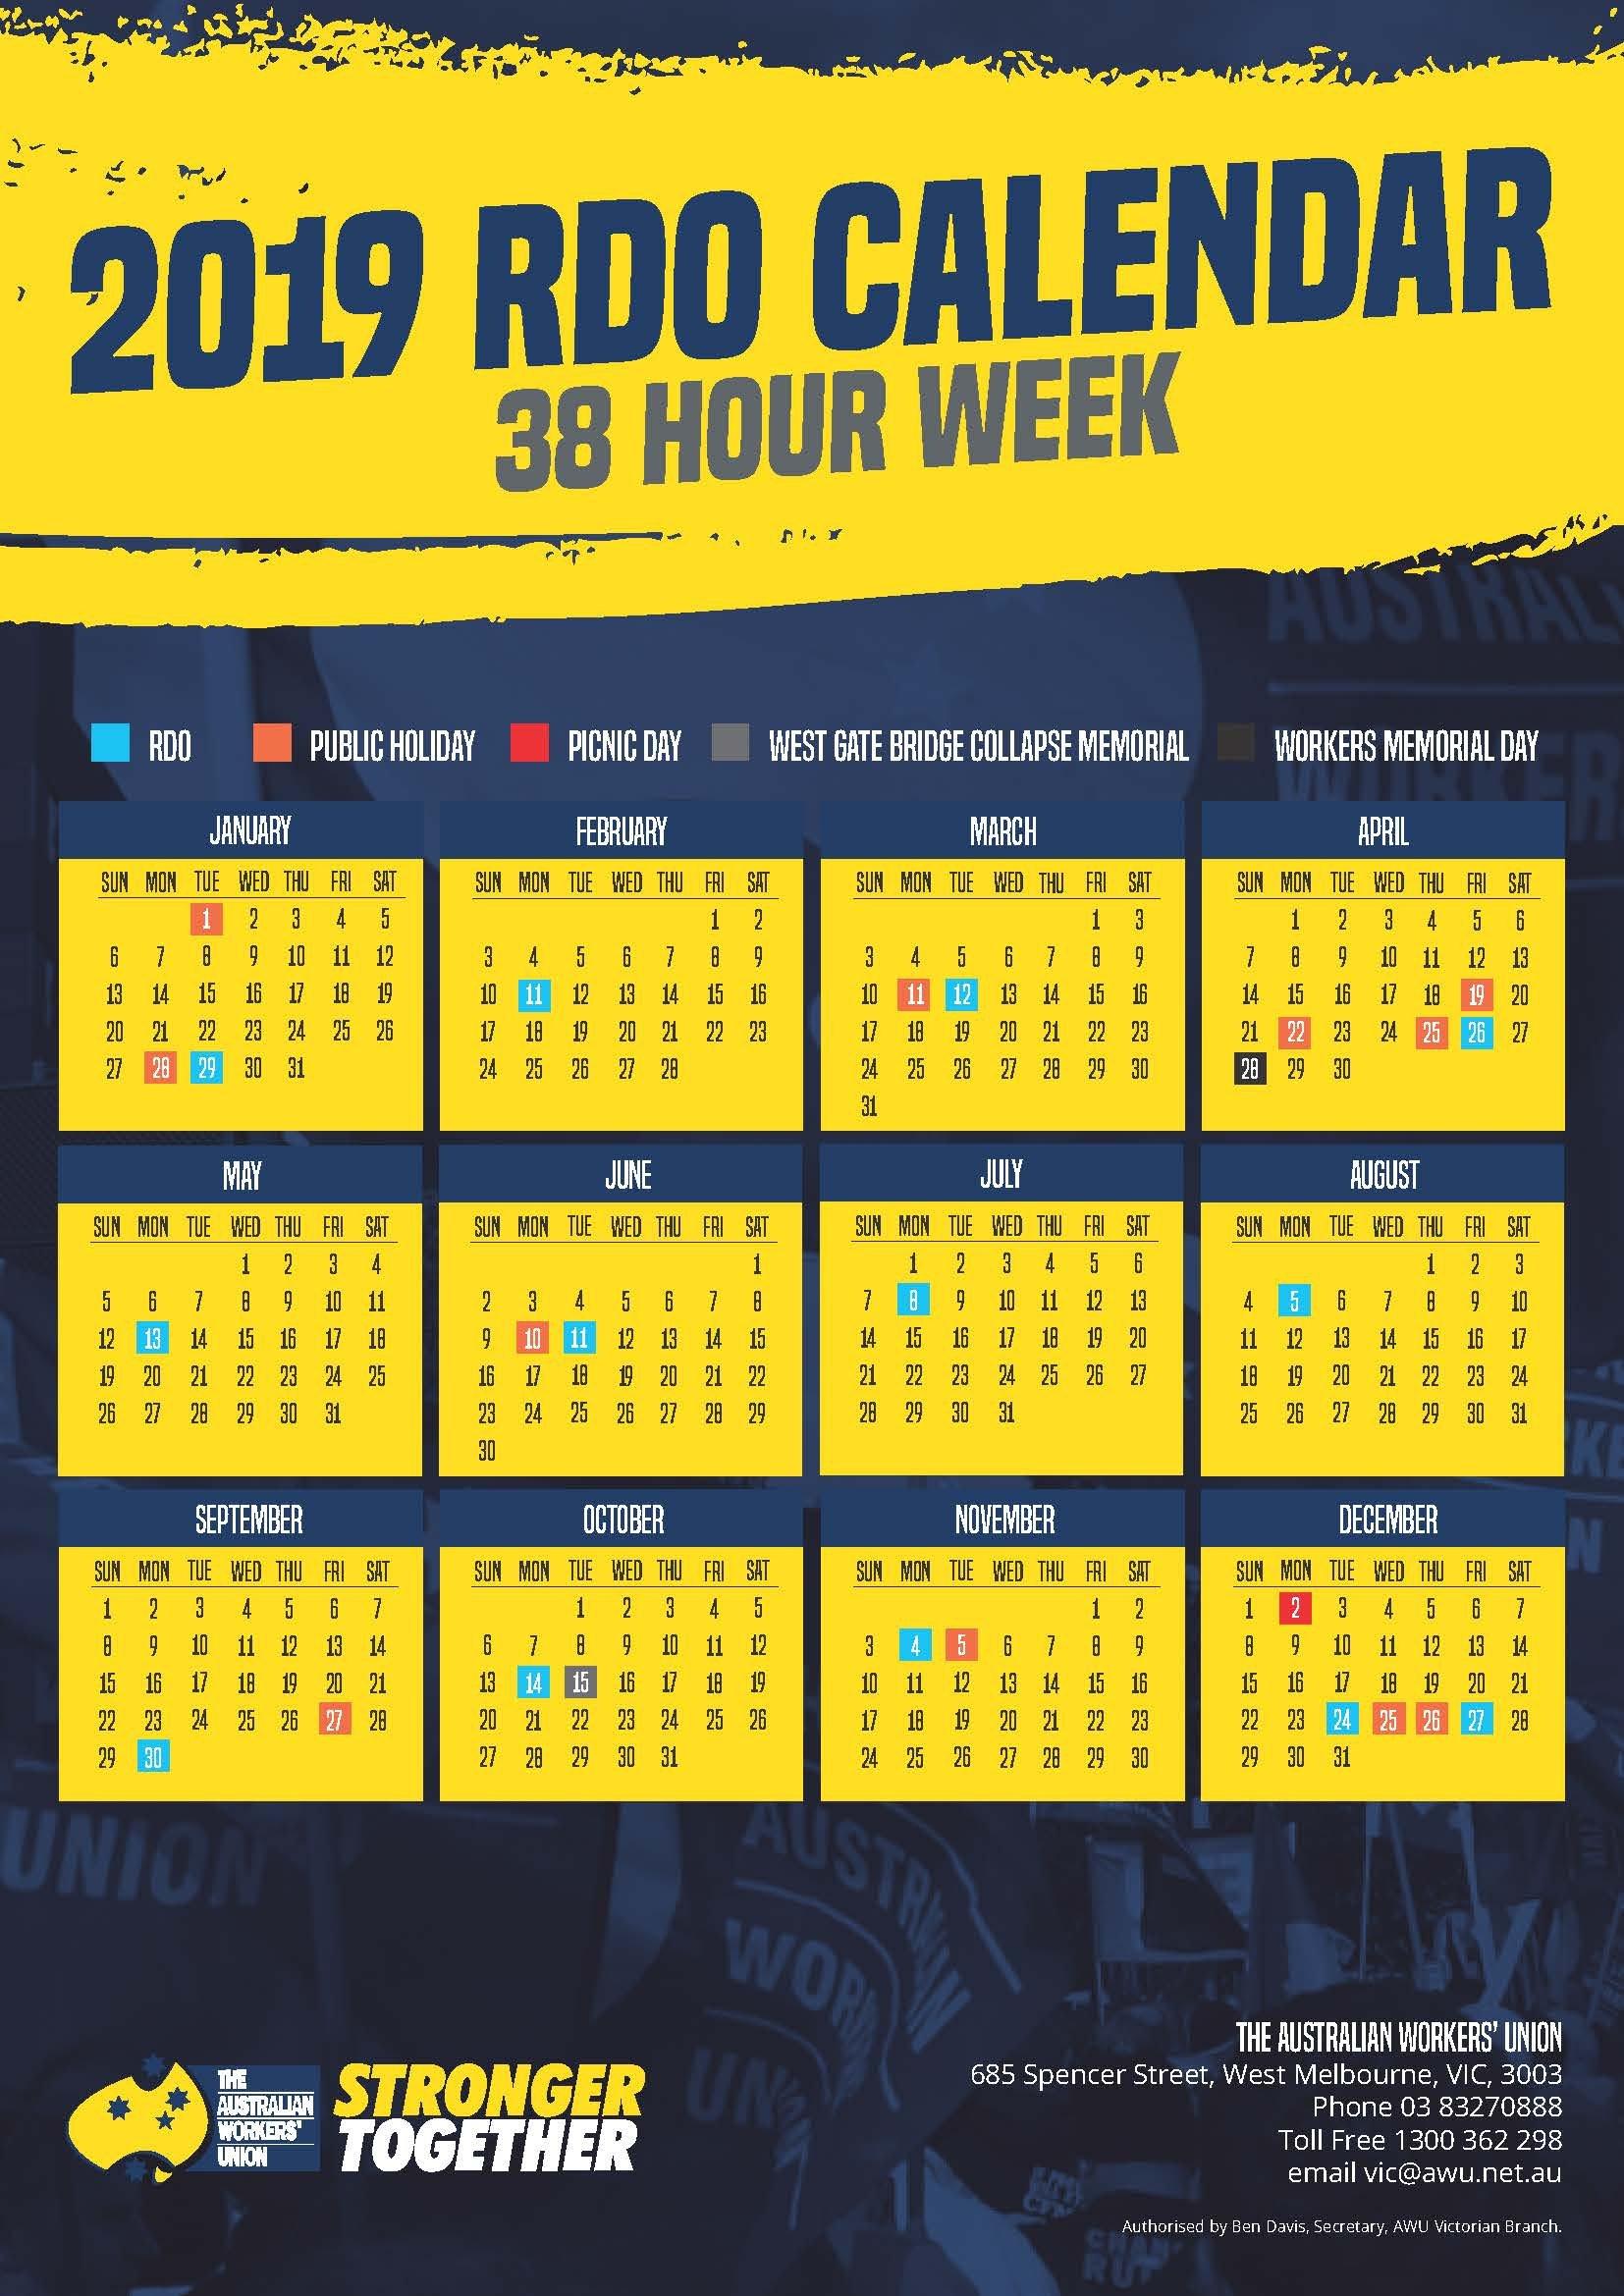 2019 36 And 38 Hour Week Rdo Calendars   Awu Victoria Calendar 2019 Victoria